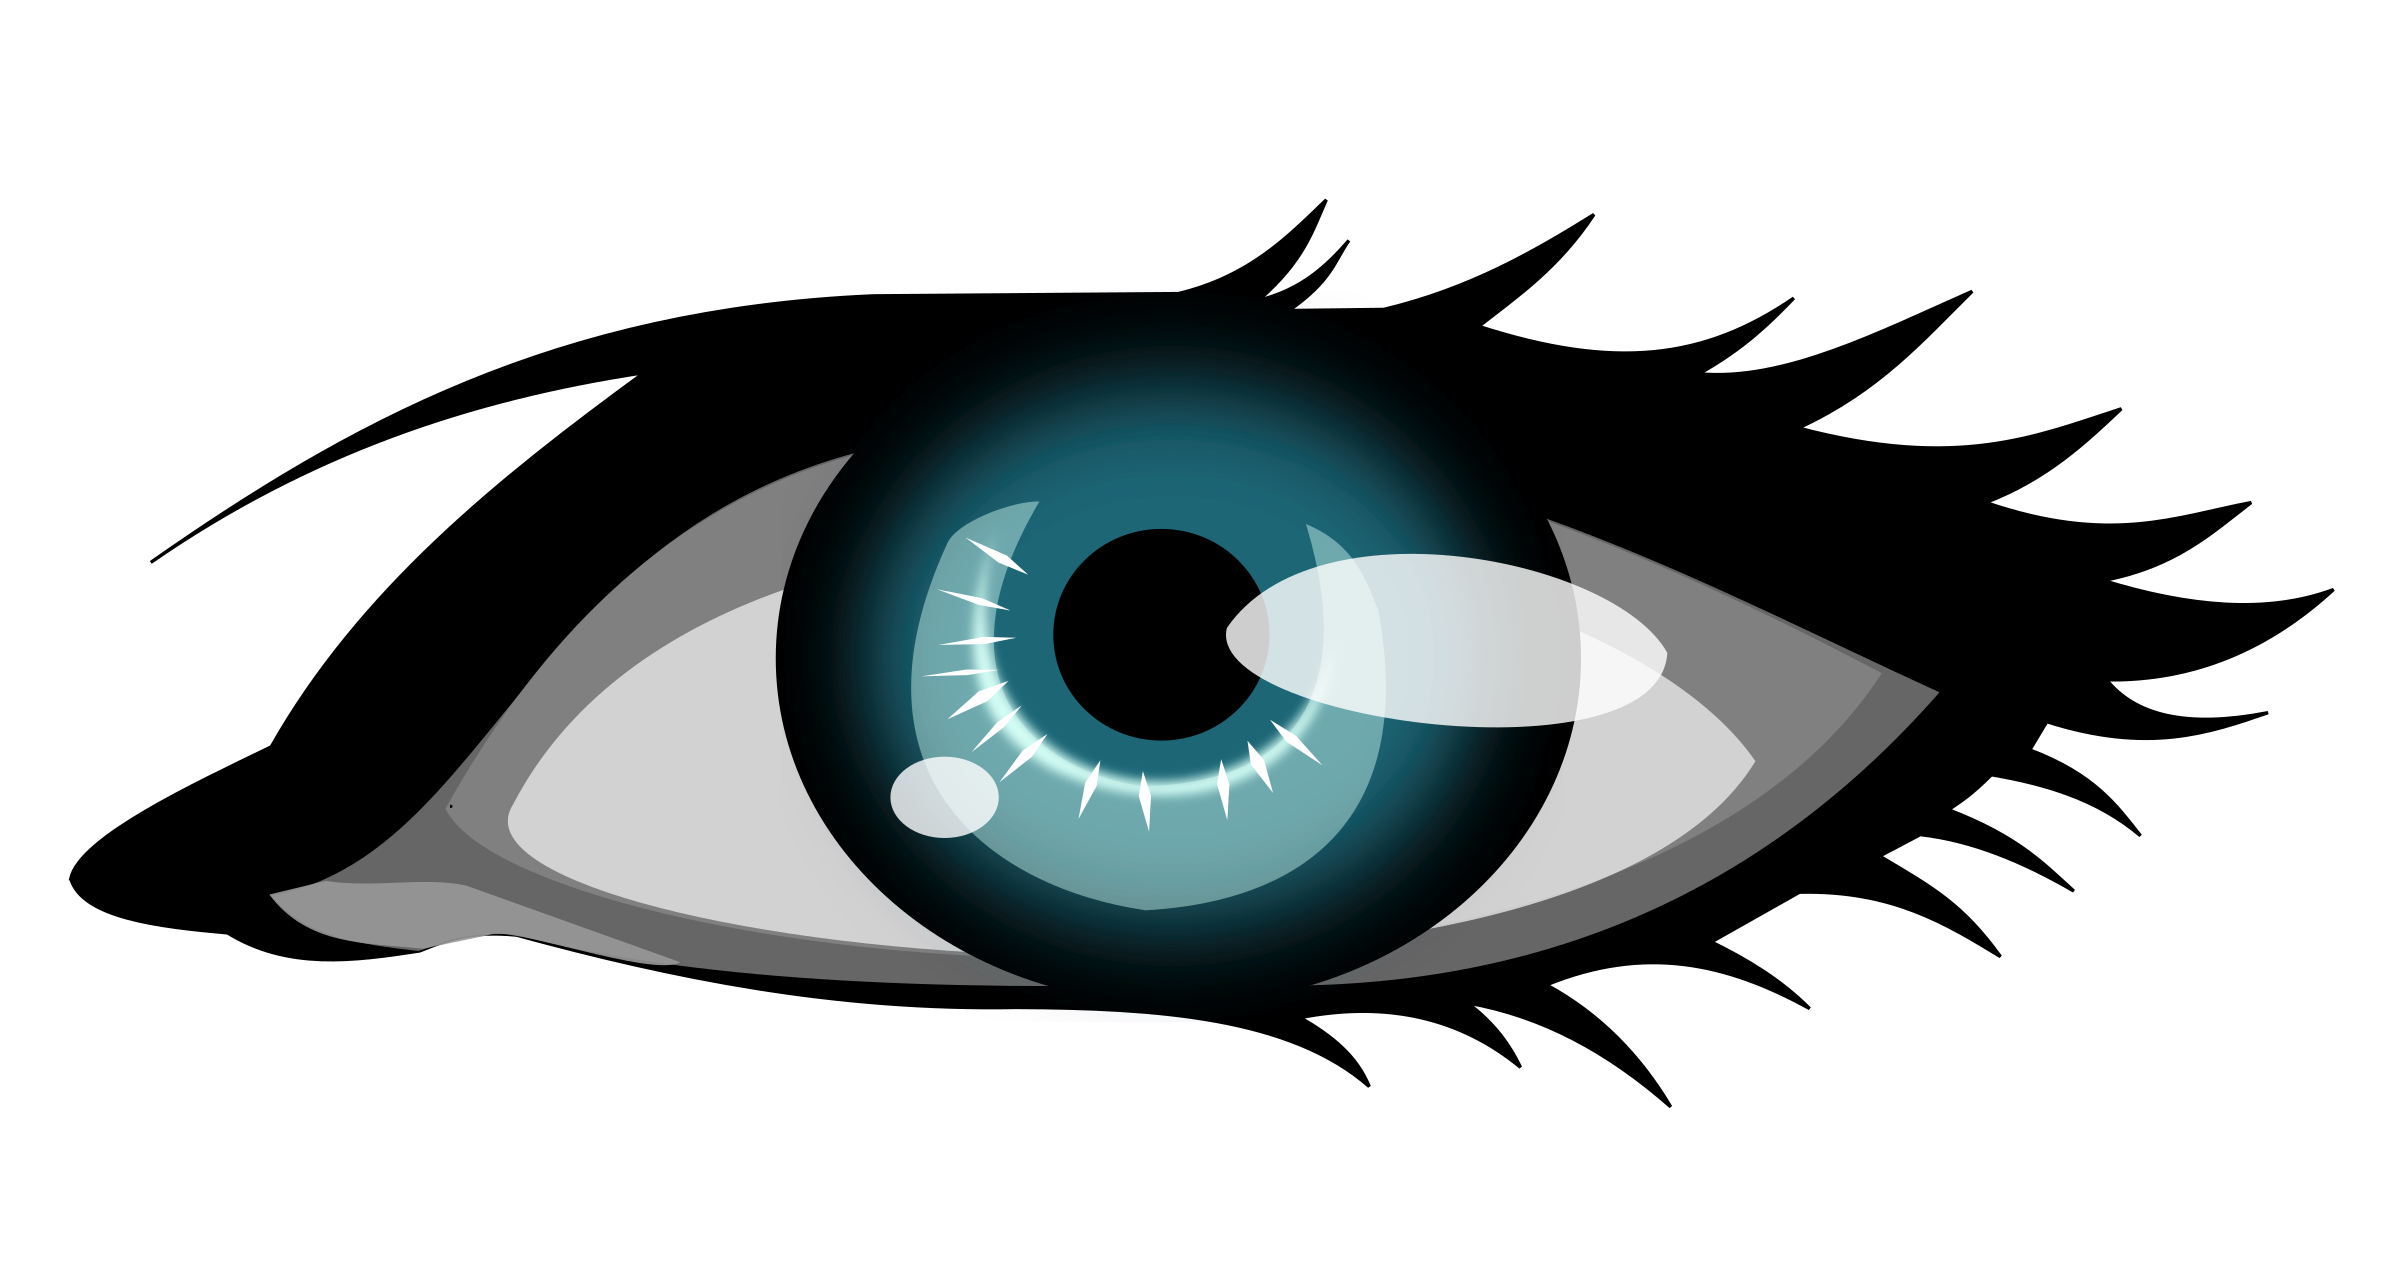 Eyelashes clipart clip art. Olhar the eye big